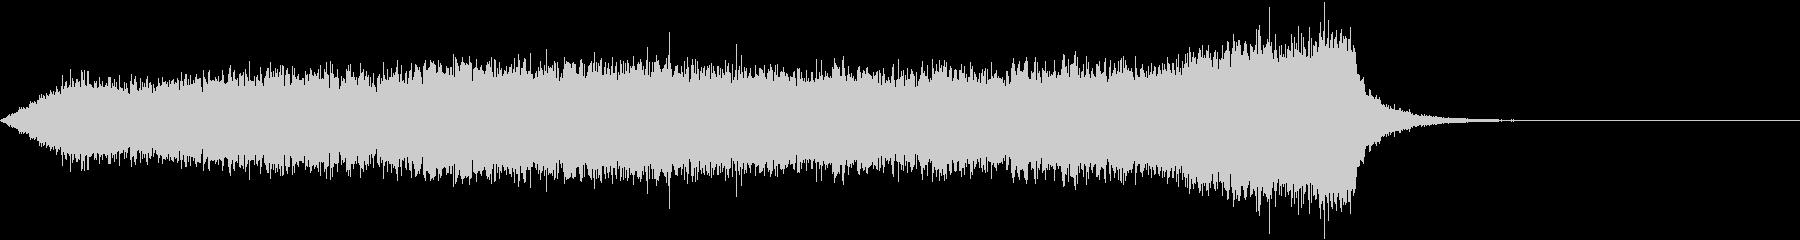 CINEMATIC RISER_03の未再生の波形